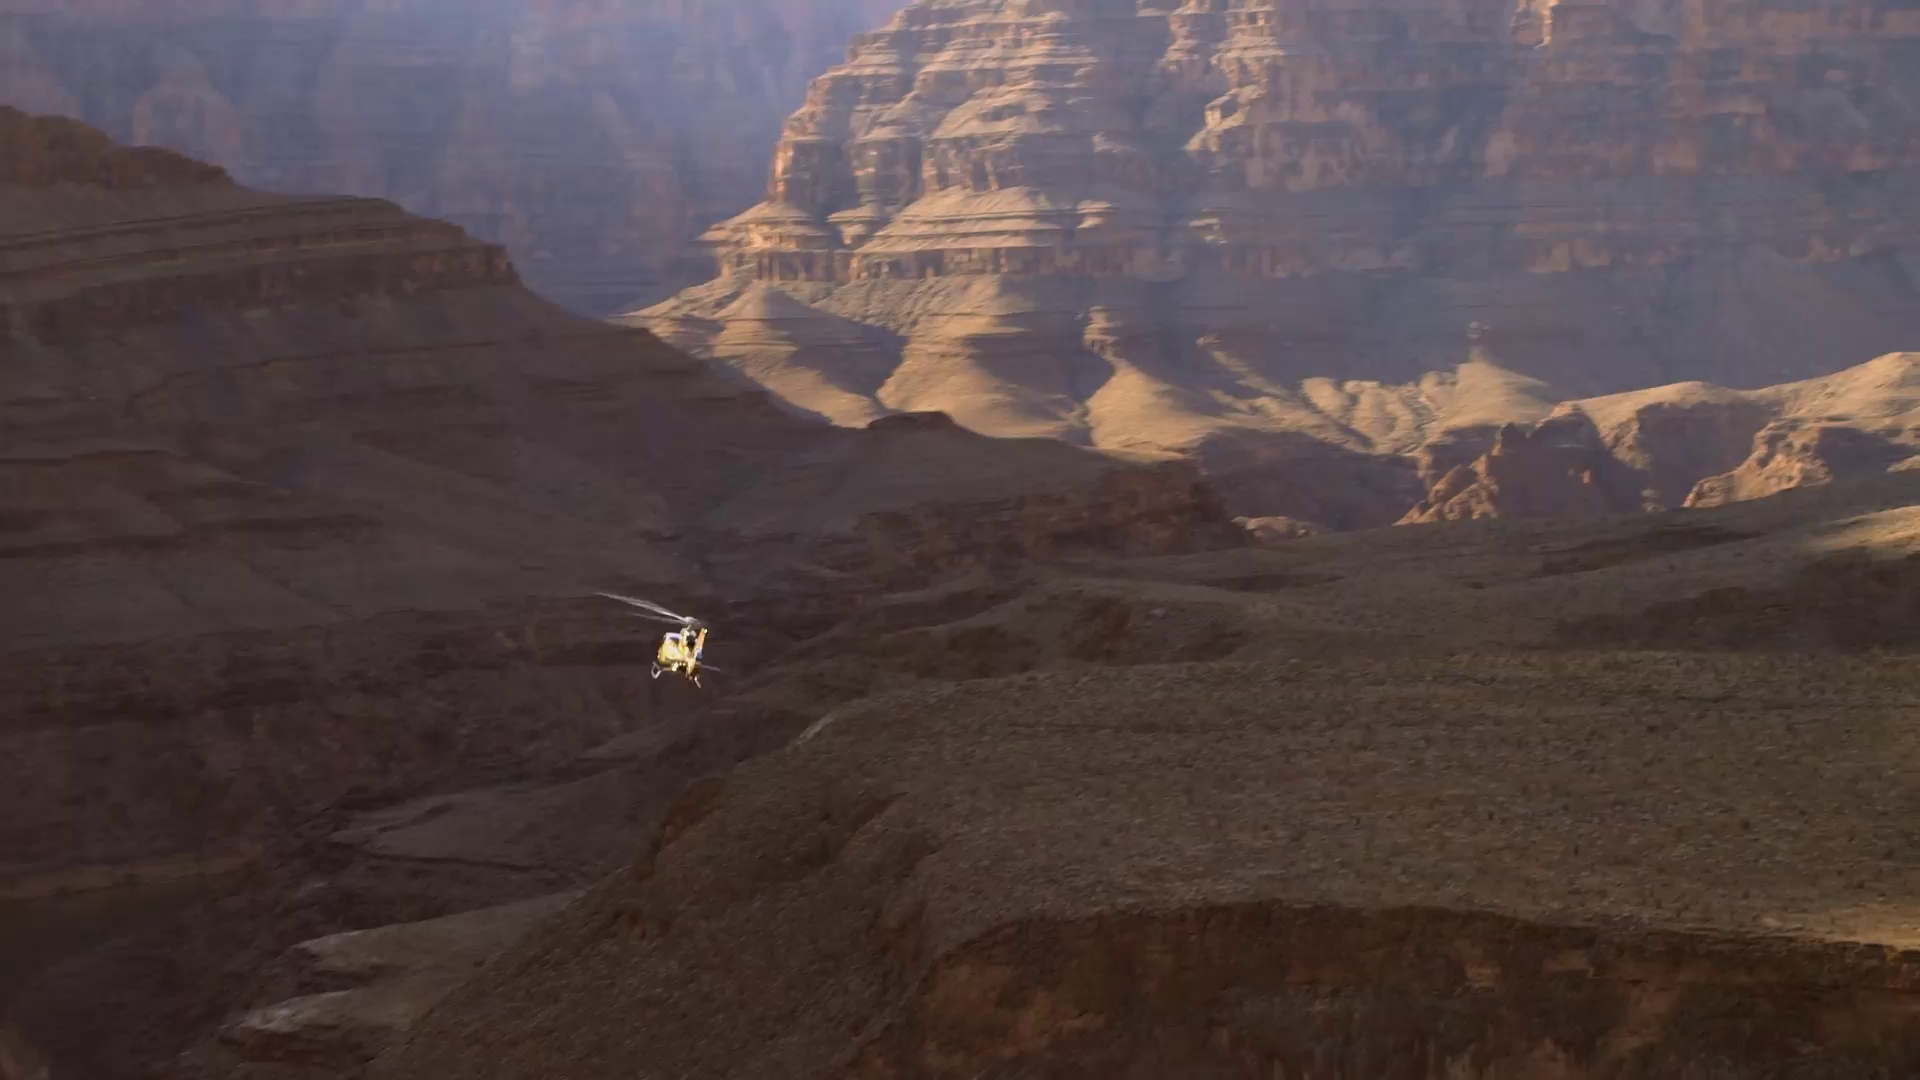 Sunset Grand Canyon Helicopter Tour Sundance